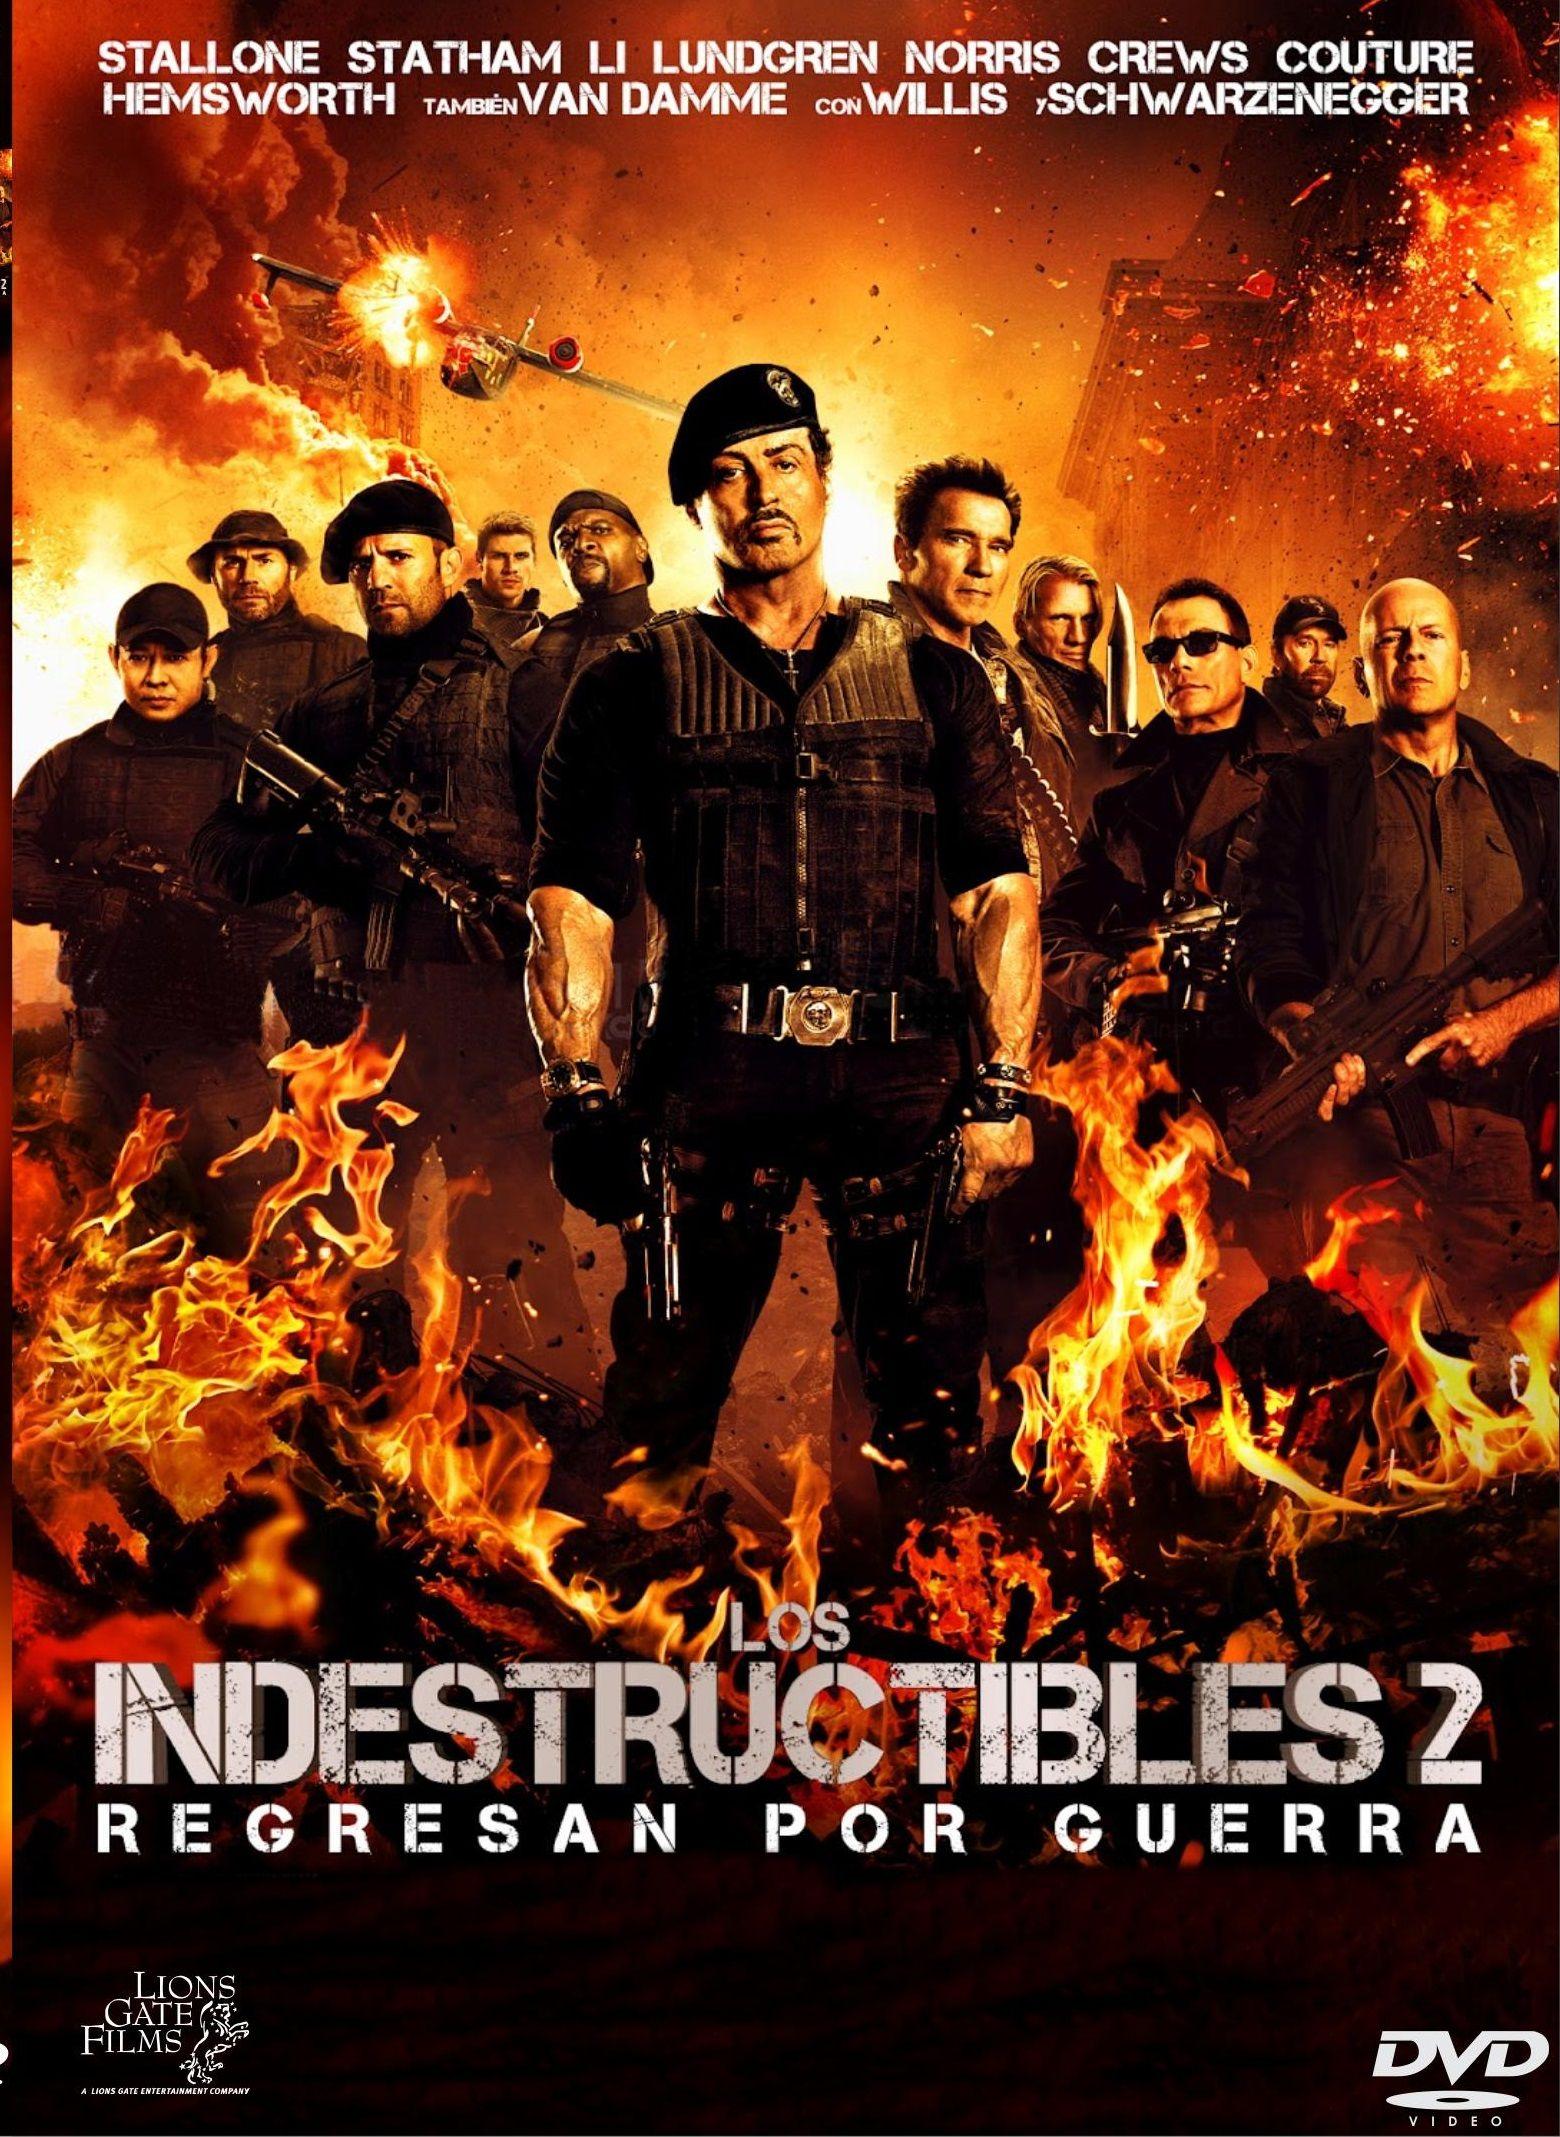 Descripcion Descargar Los Indestructibles 2 Brrip Latino Pl Gratis Por Mediafire Mega O Torrent Full The Expendables 2012 Movie Movie Posters